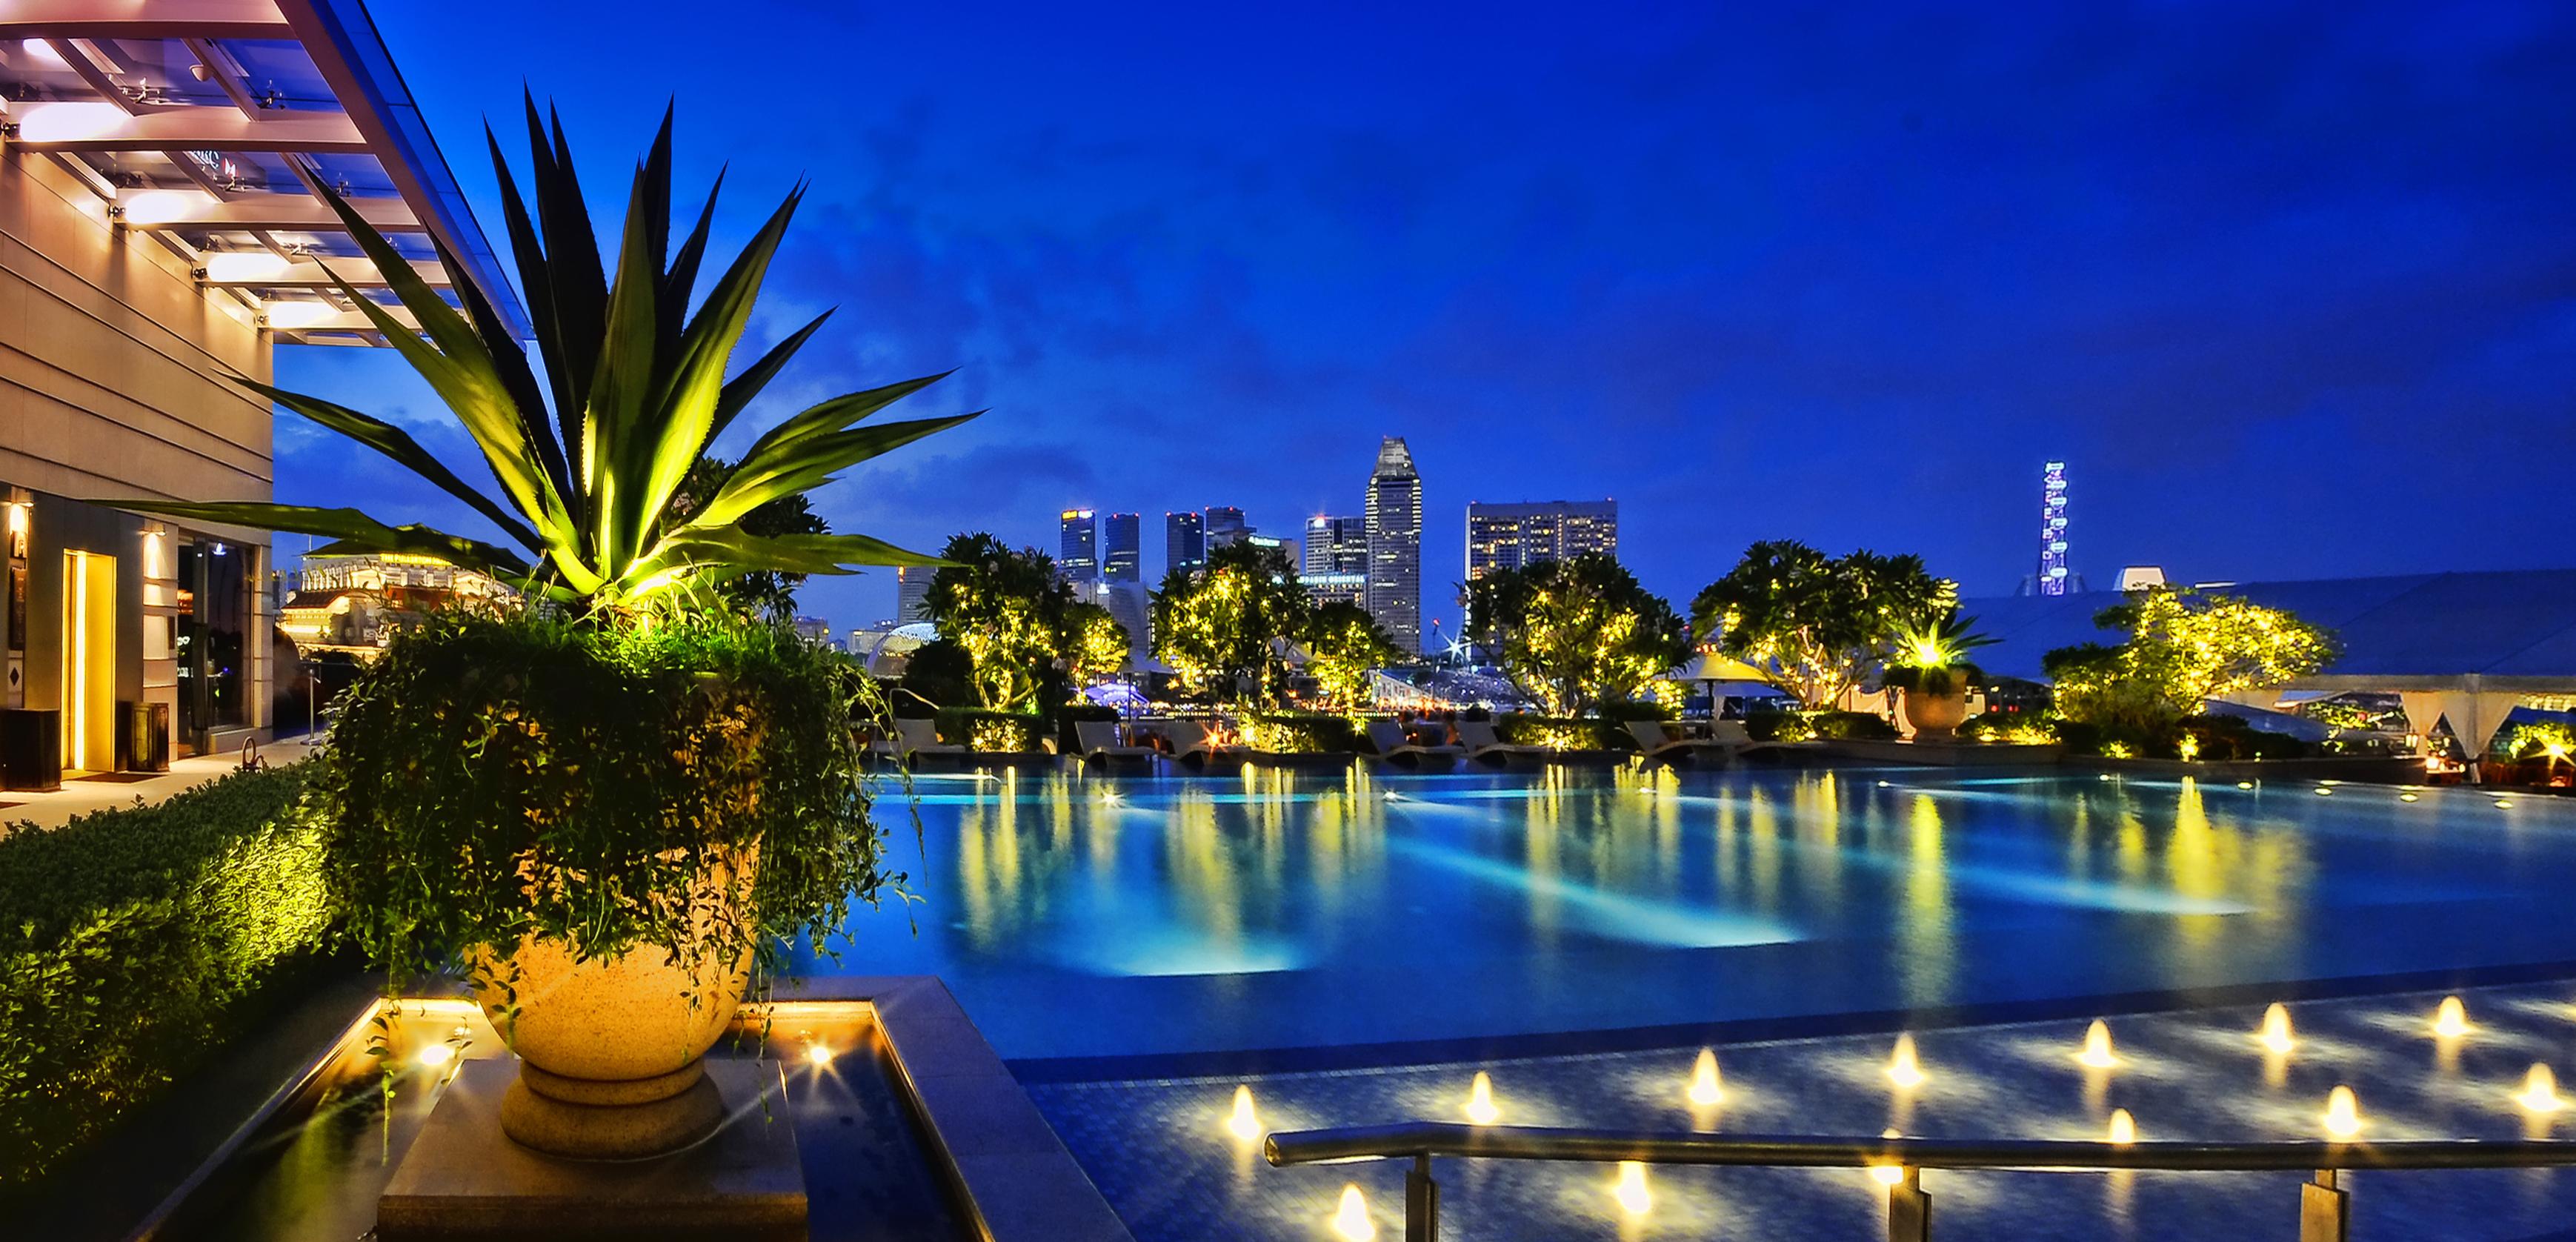 Hintergrundbilder : Erholungsort, Eigentum, majorelle blue, Pool ...